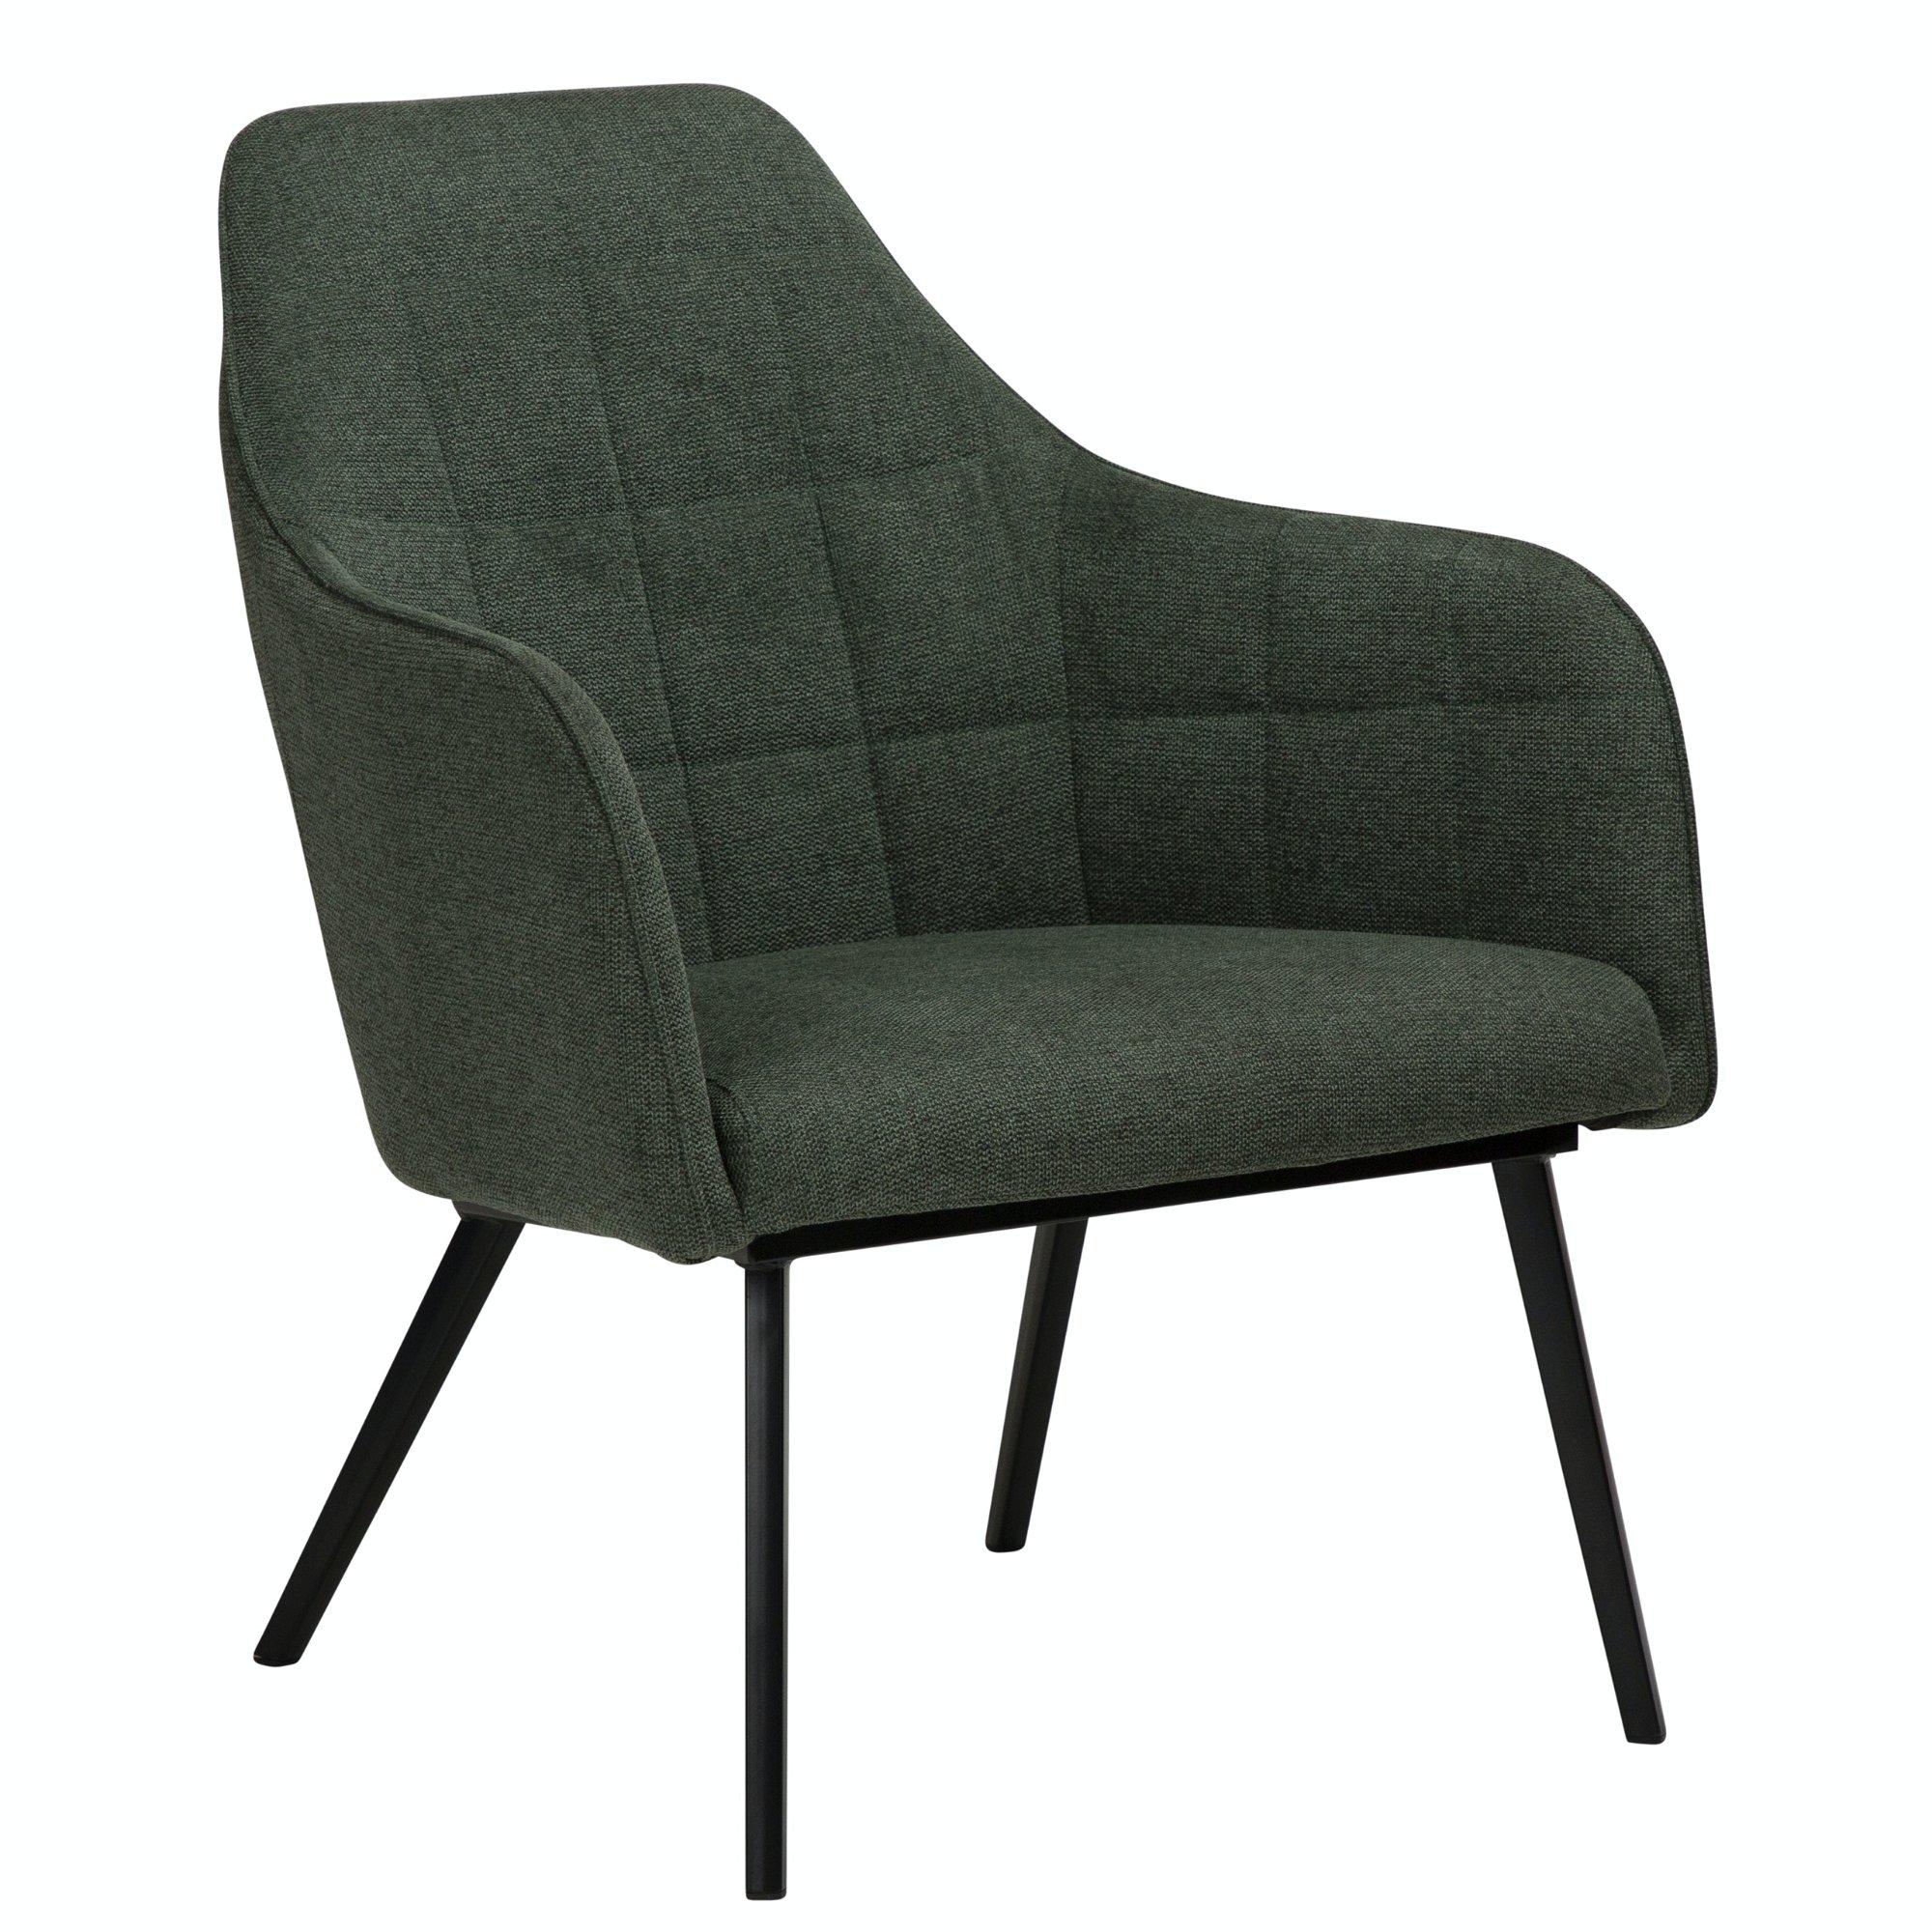 Køb Embrace, Loungestol, Stof by DAN-FORM Denmark (H: 83 cm. B: 68 cm. L: 77 cm., Grøn)